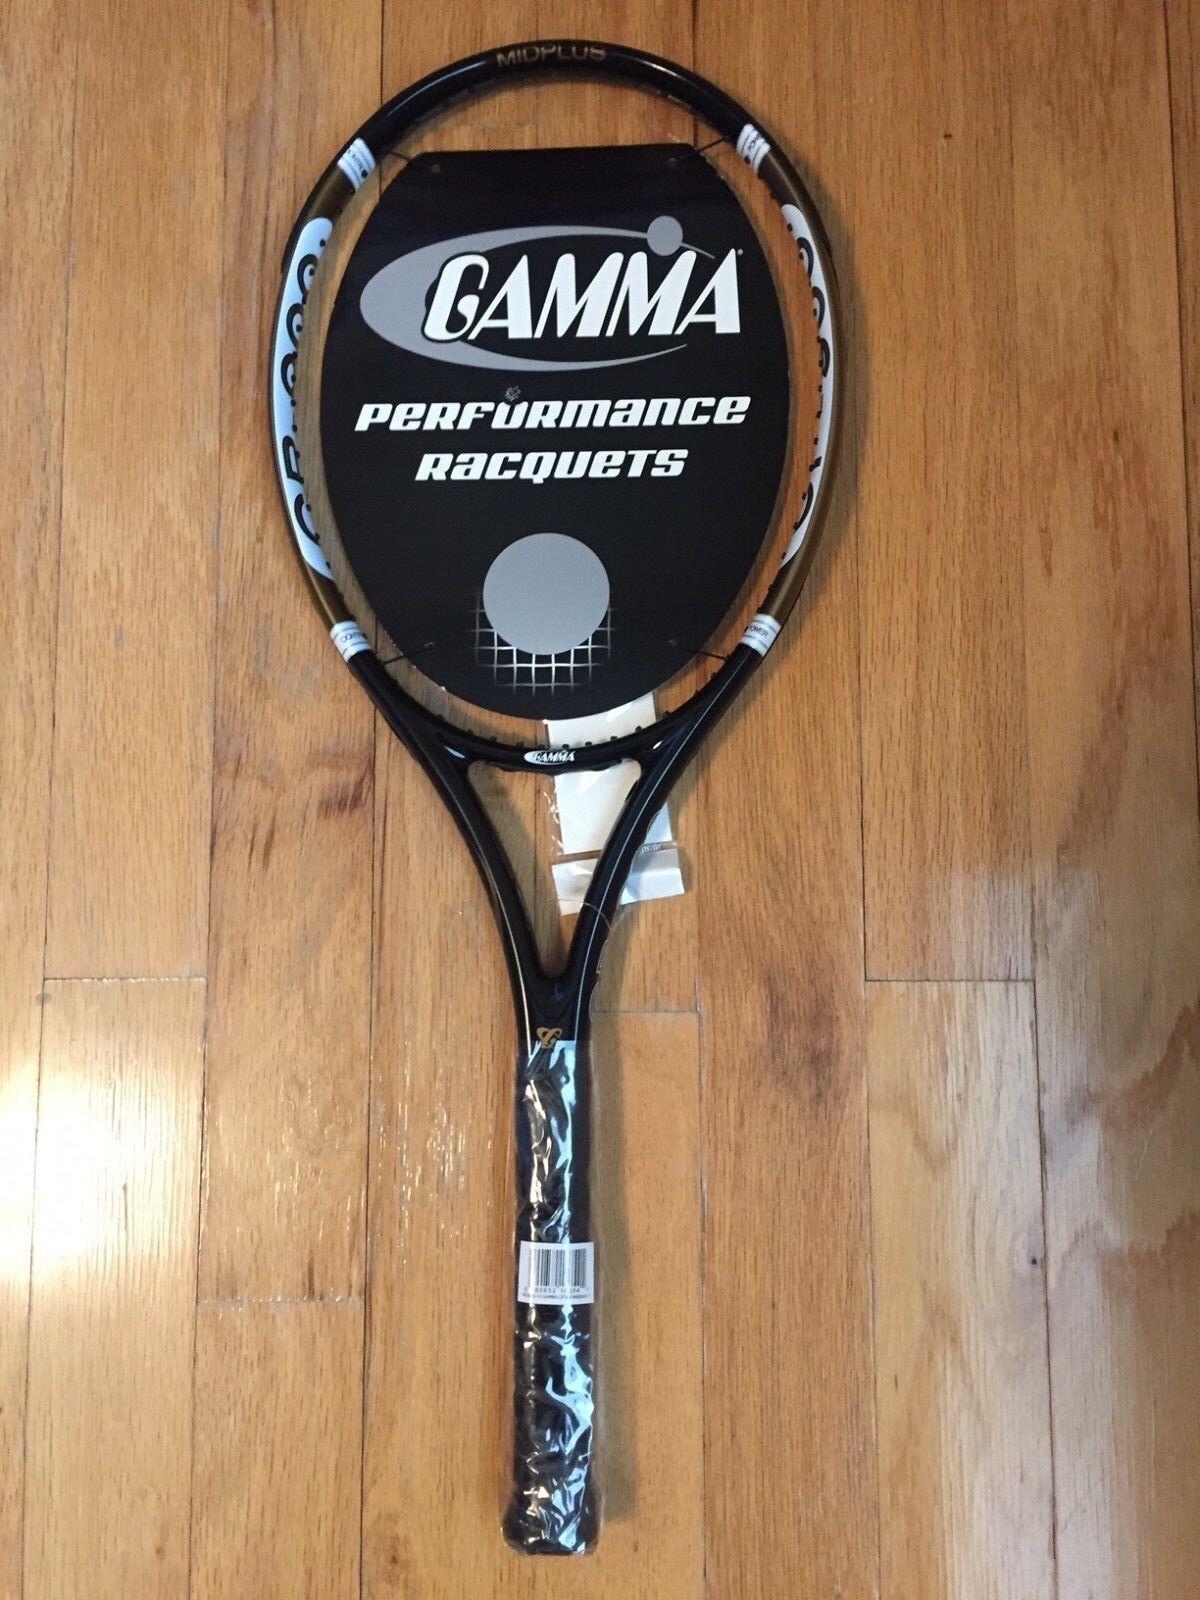 Gamma Cp Tenis 900 Raqueta De Tenis Cp a02bb5